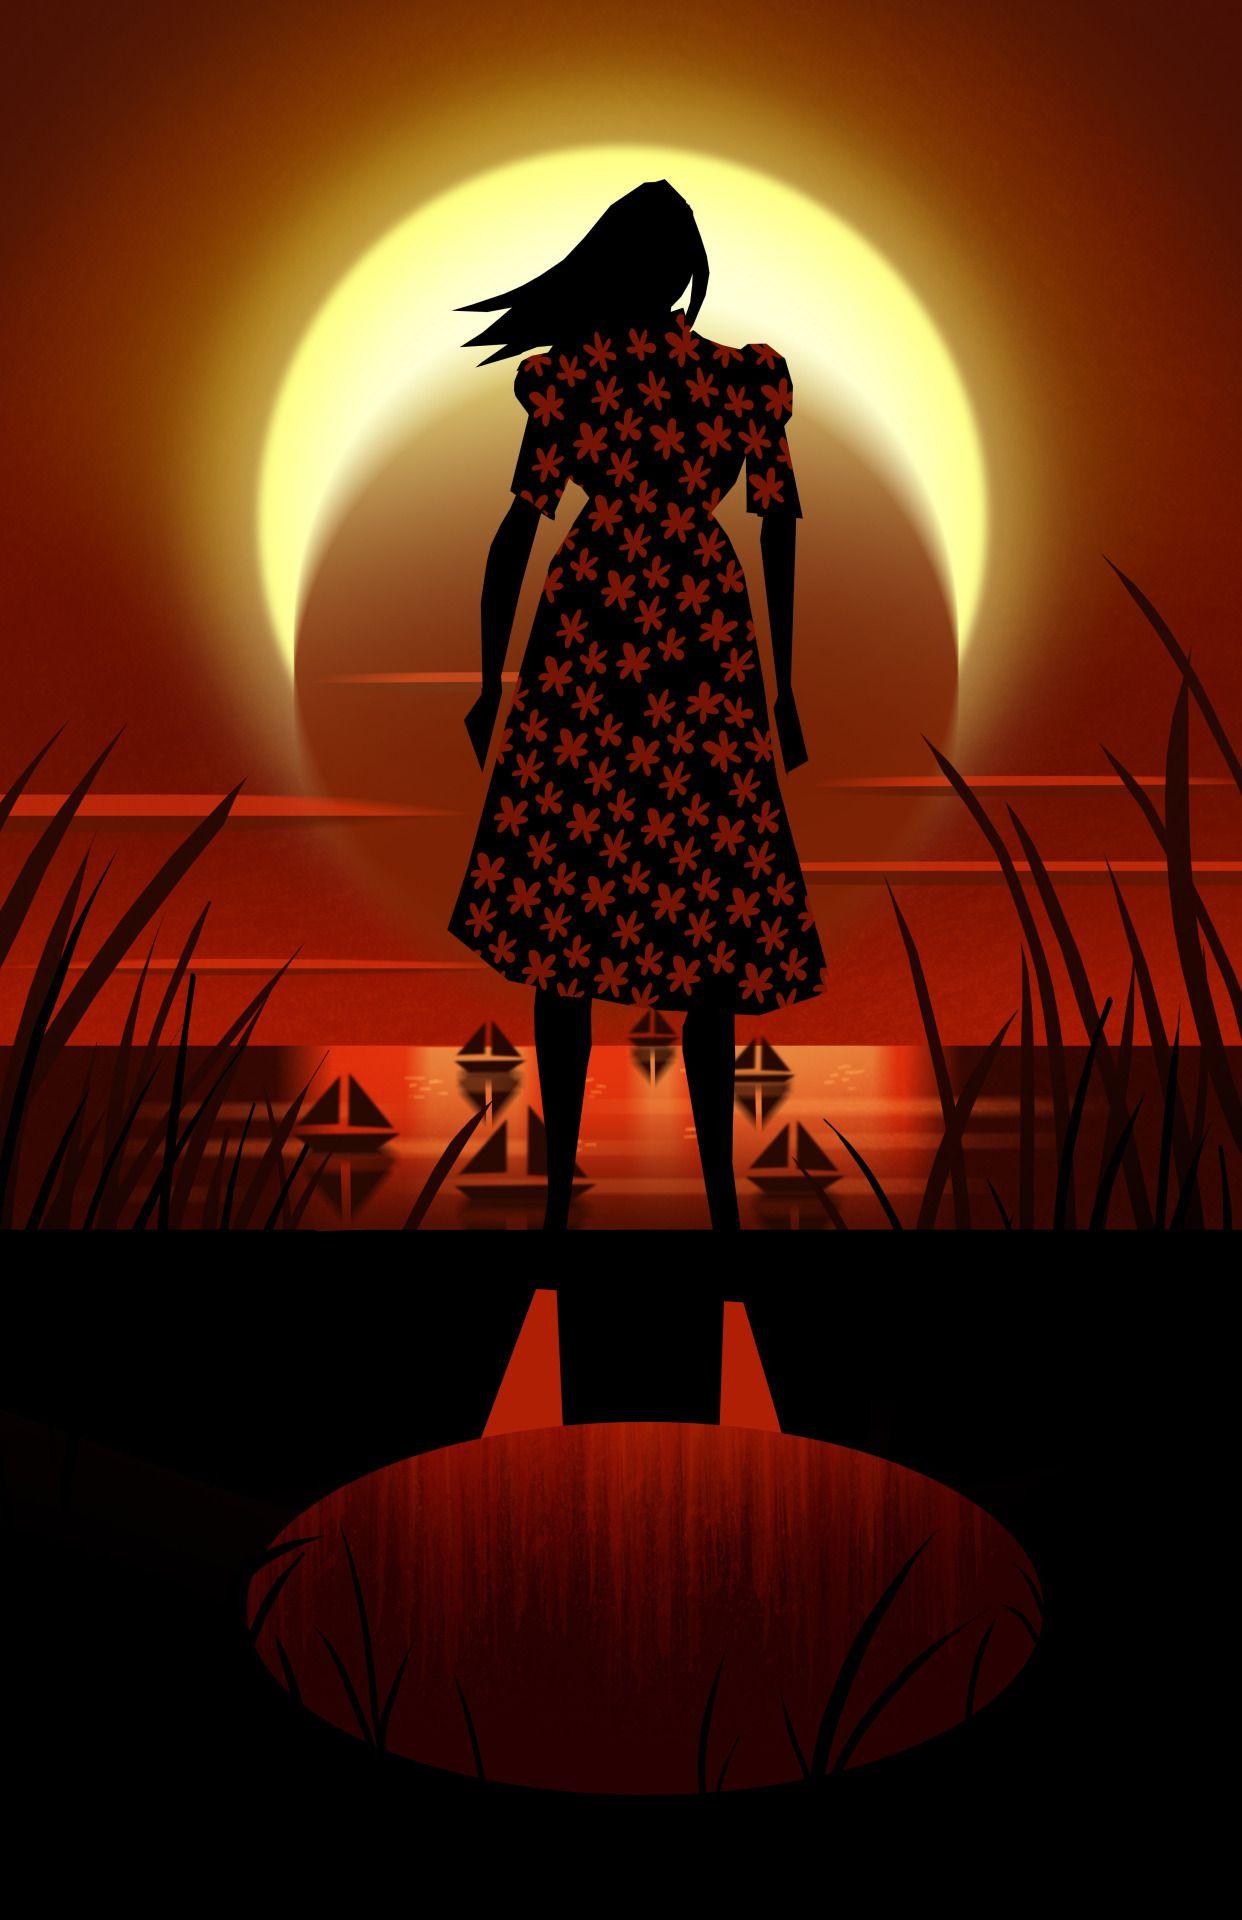 Episode Sixty Six Dolores Claiborne The Movie Dolores Claiborne Stephen King Episode